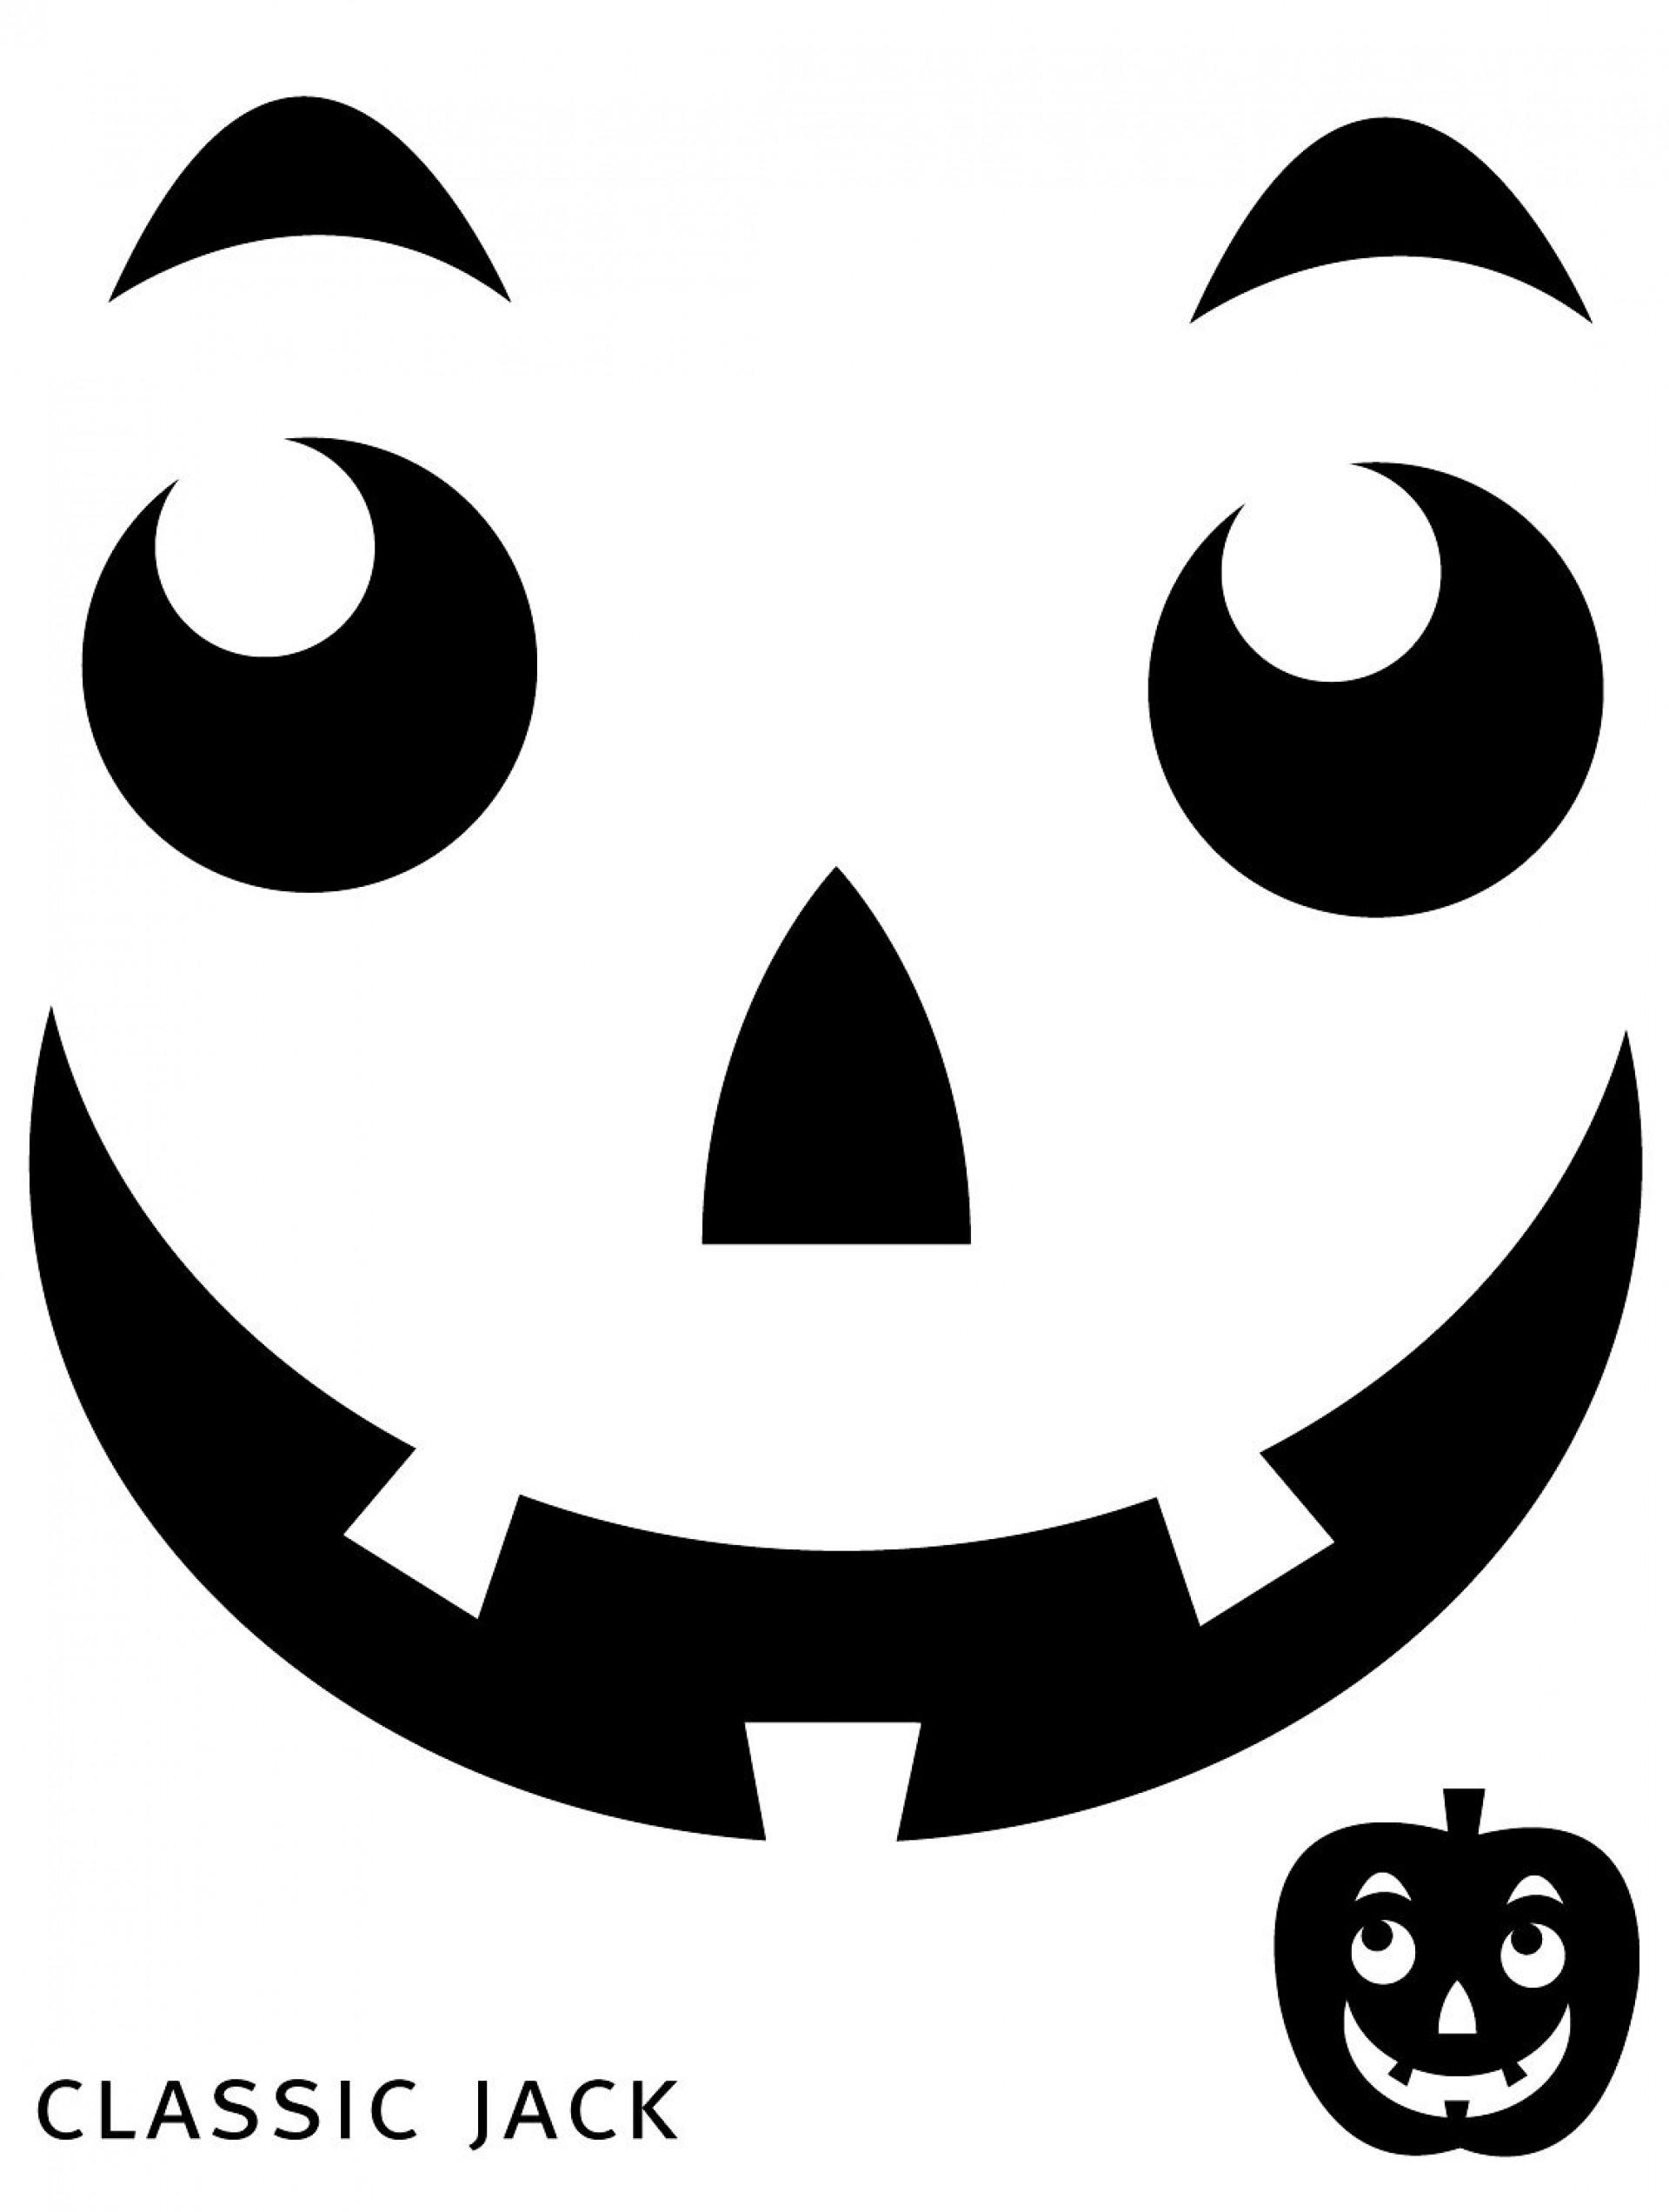 016 Free Pumpkin Carving Templates Printable Eb3Ldog8 Template - Free Pumpkin Printable Carving Patterns